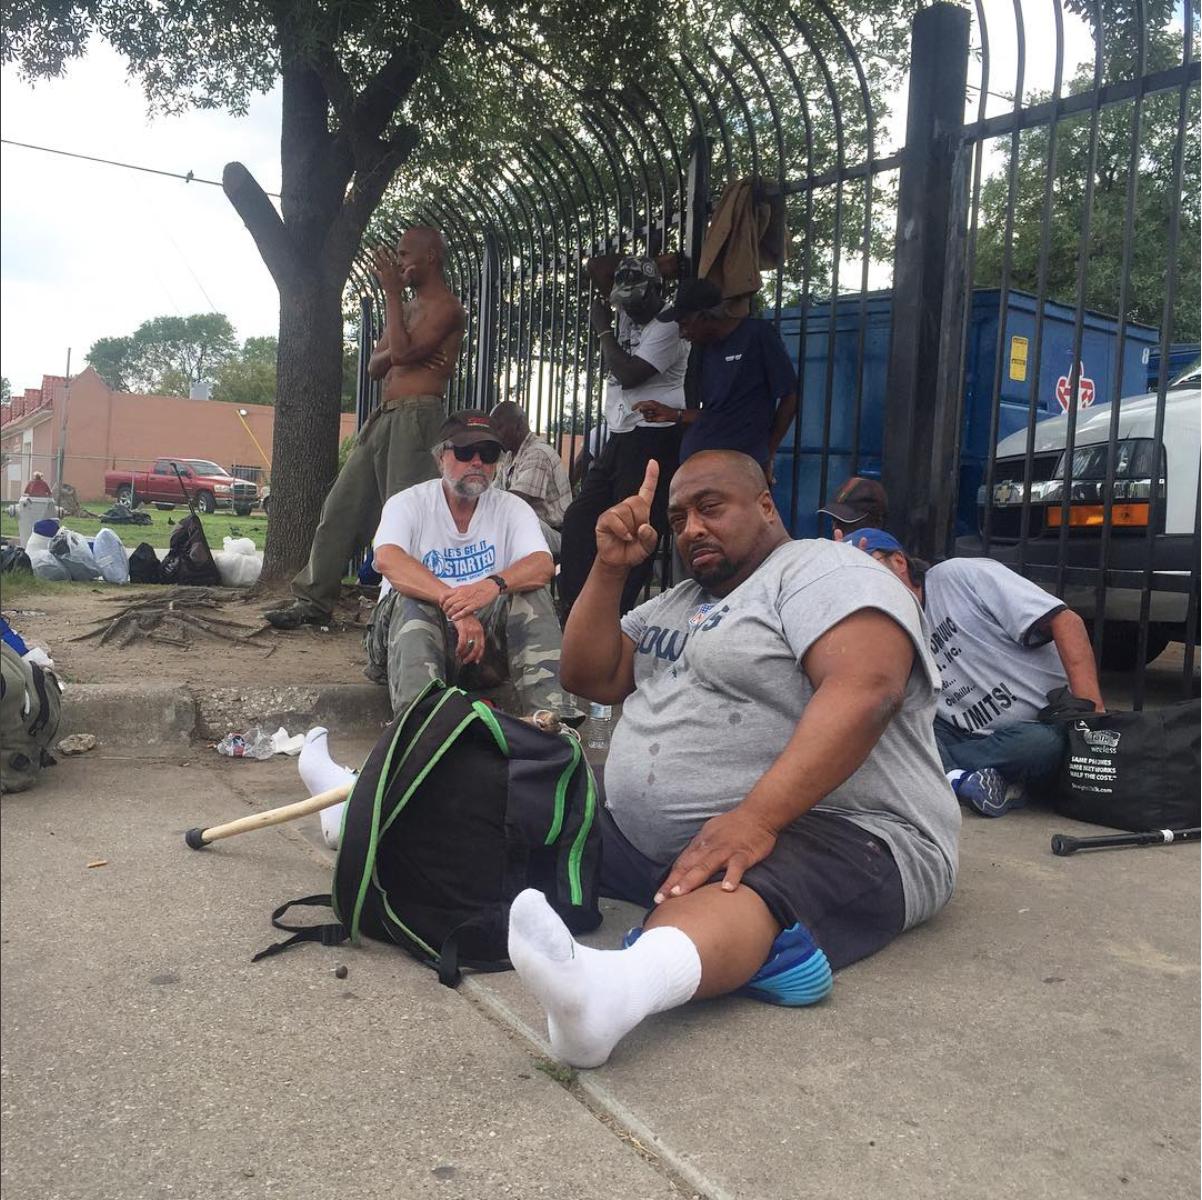 Dallas, TX. http://www.dallasobserver.com/news/inside-the-dallas-homeless-shelter-where-patrick-ward-died-8672712